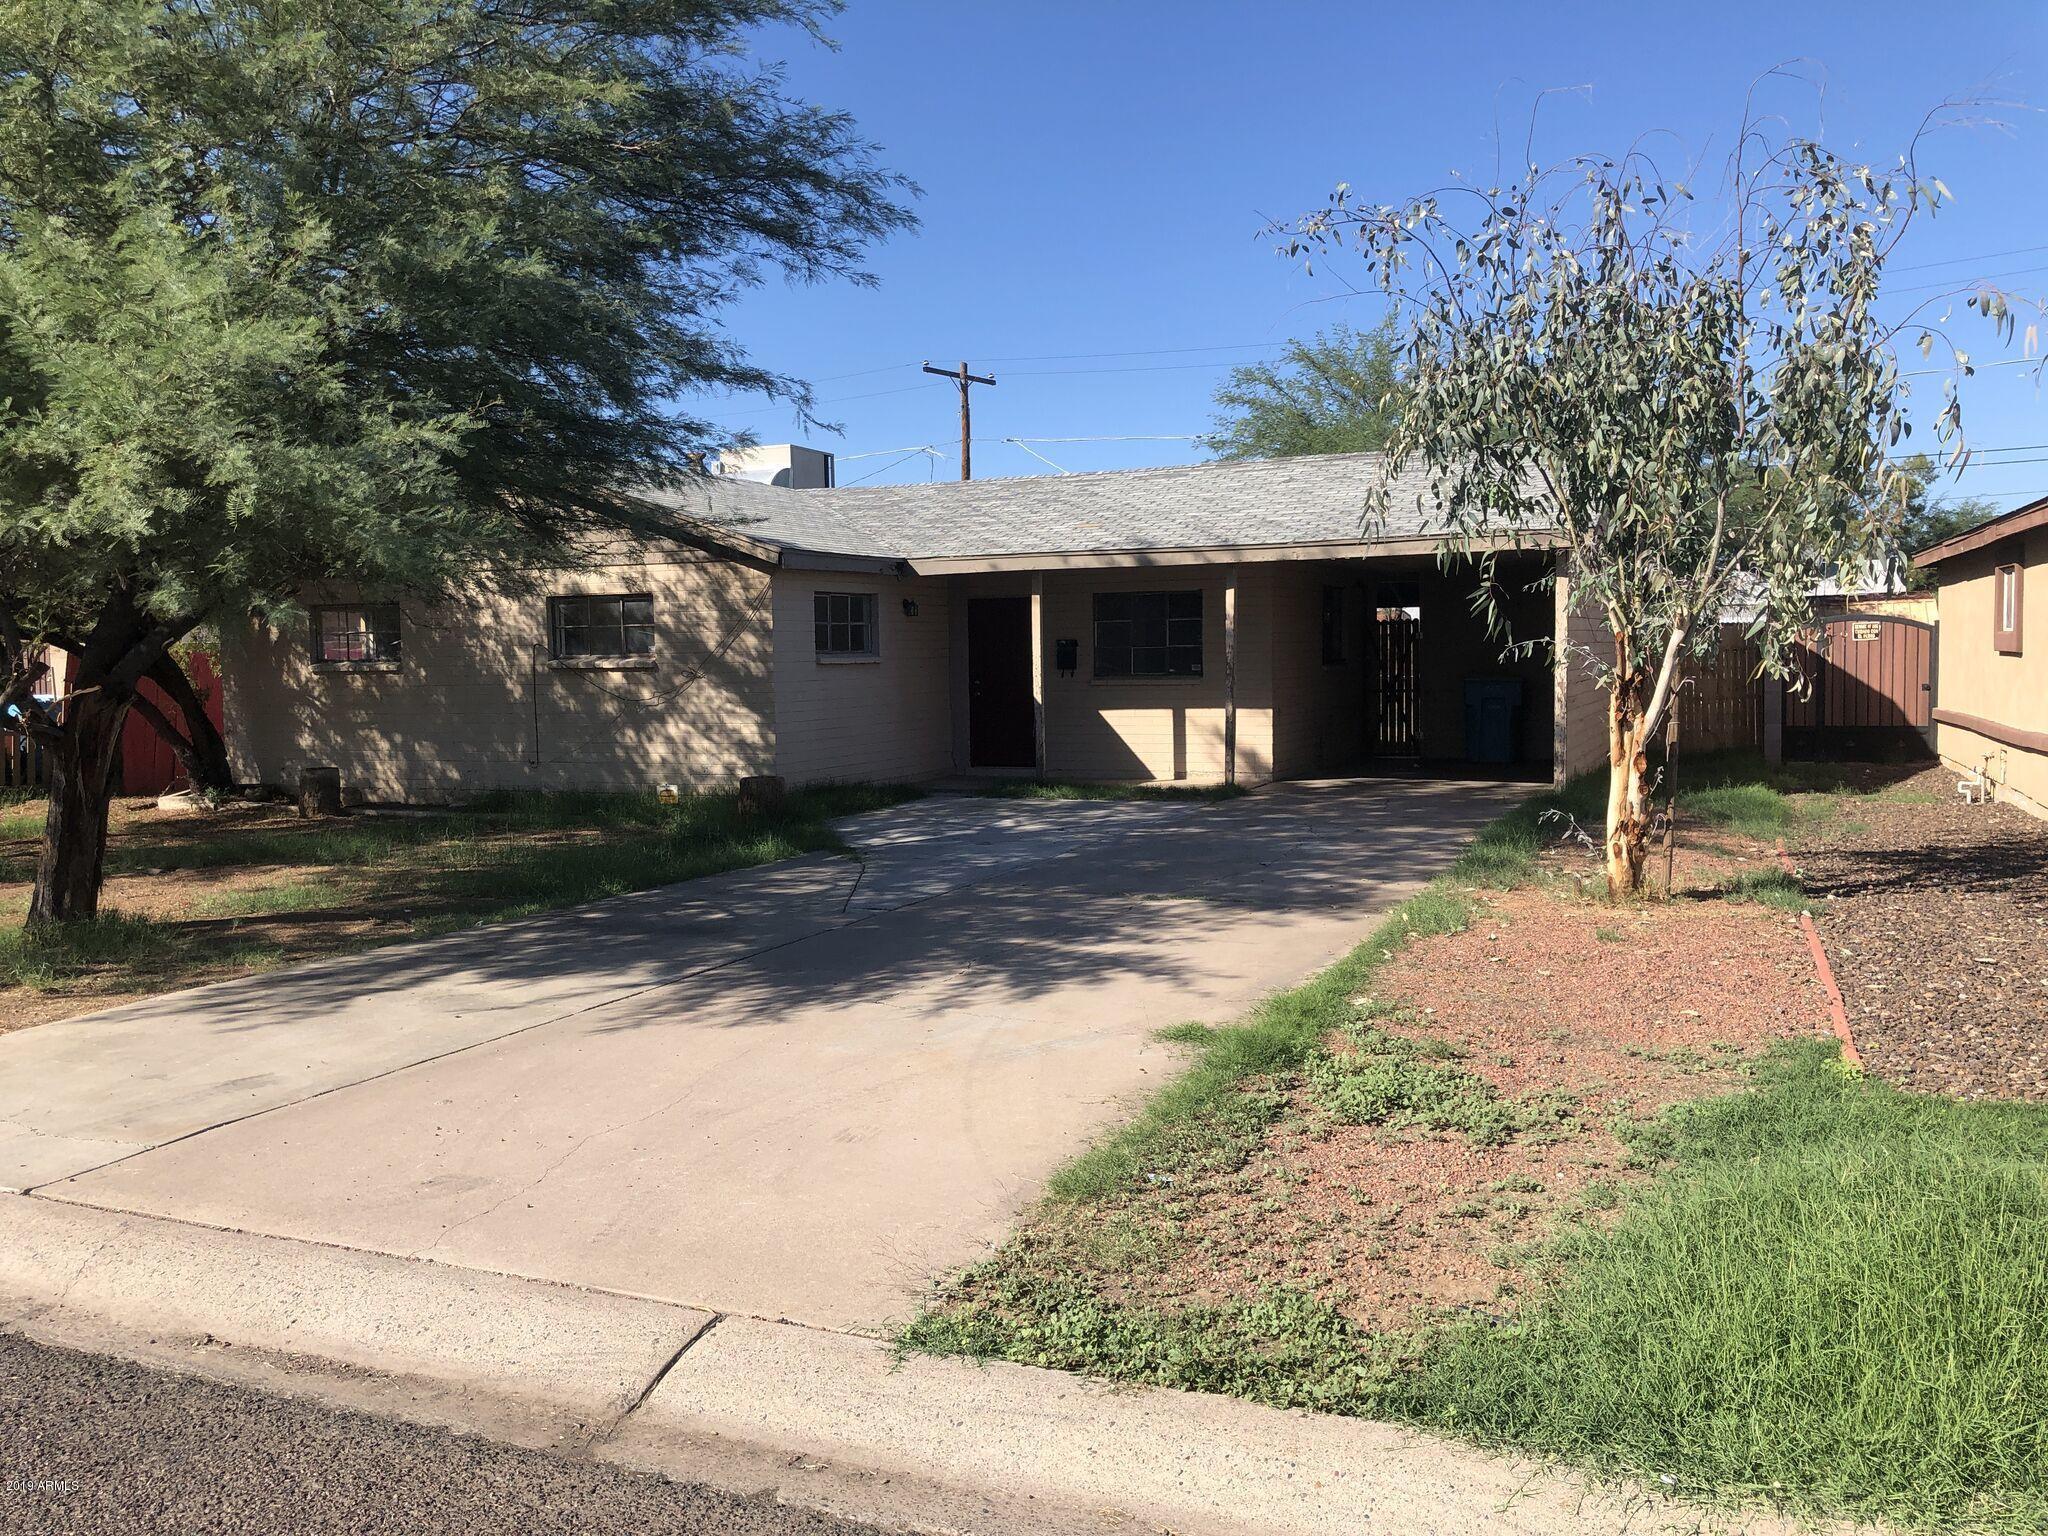 MLS 5989203 2810 W HAZELWOOD Street, Phoenix, AZ 85017 Affordable Homes in Phoenix